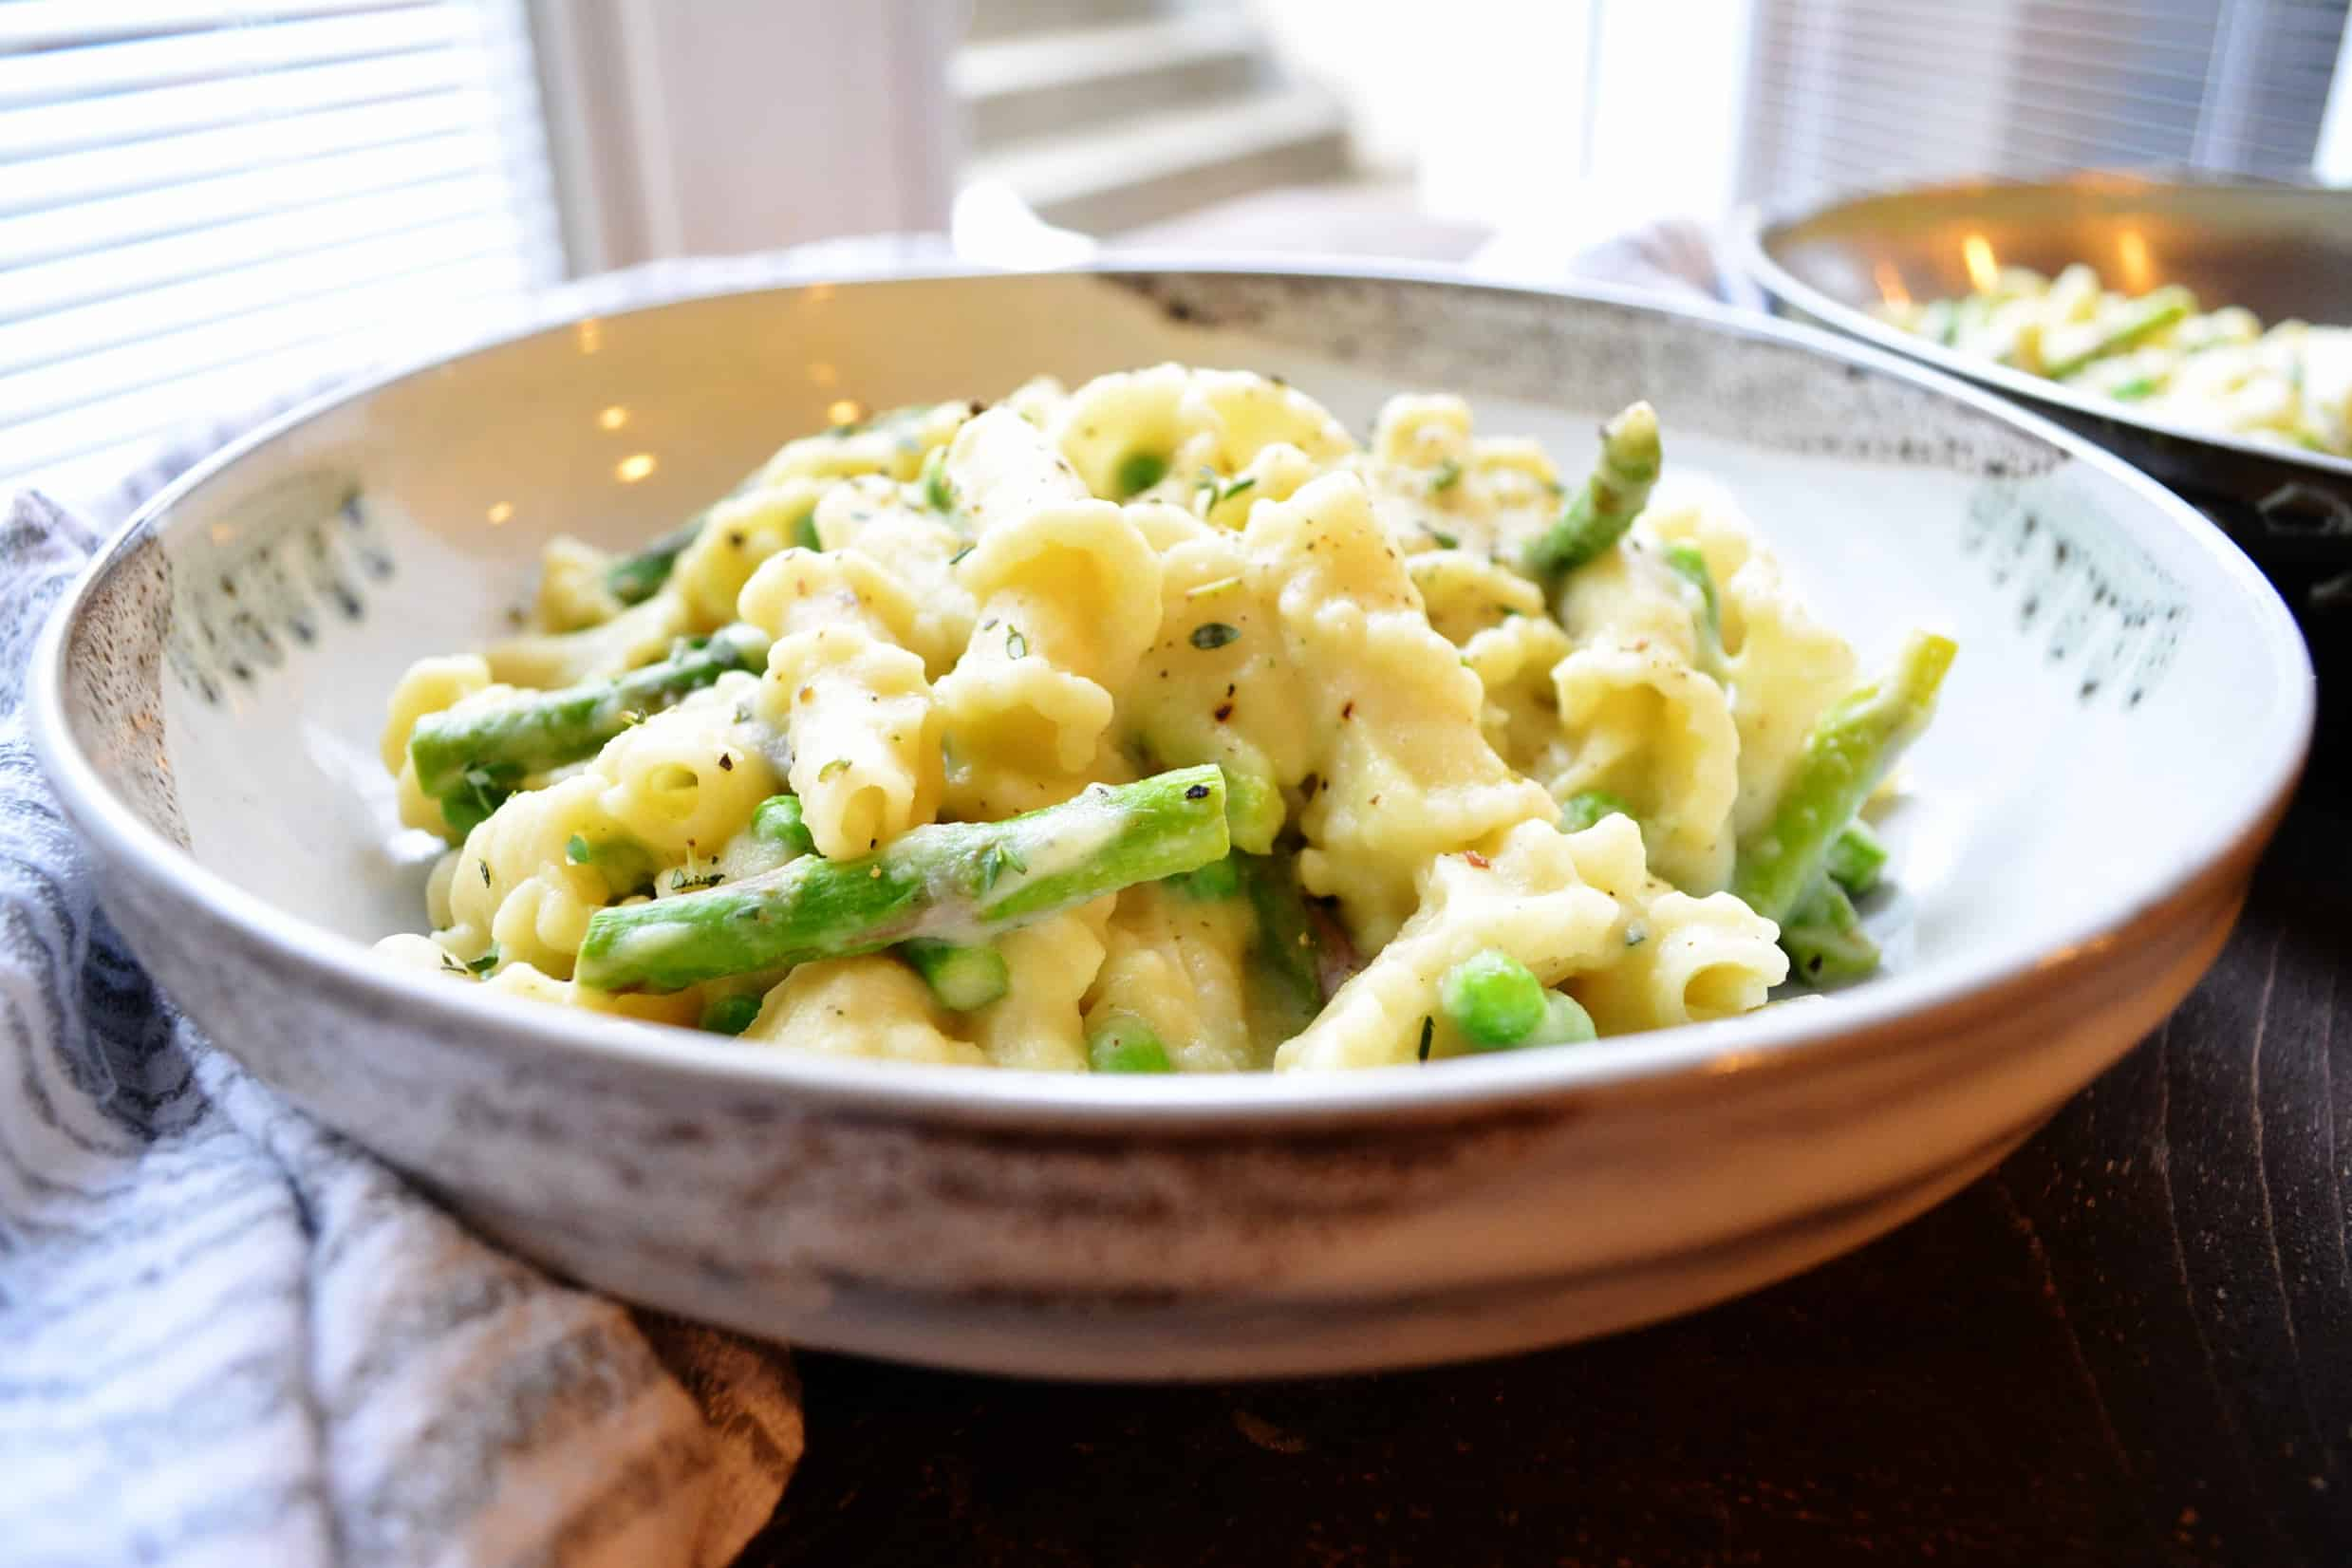 Creamy Garlic Pasta with Asparagus